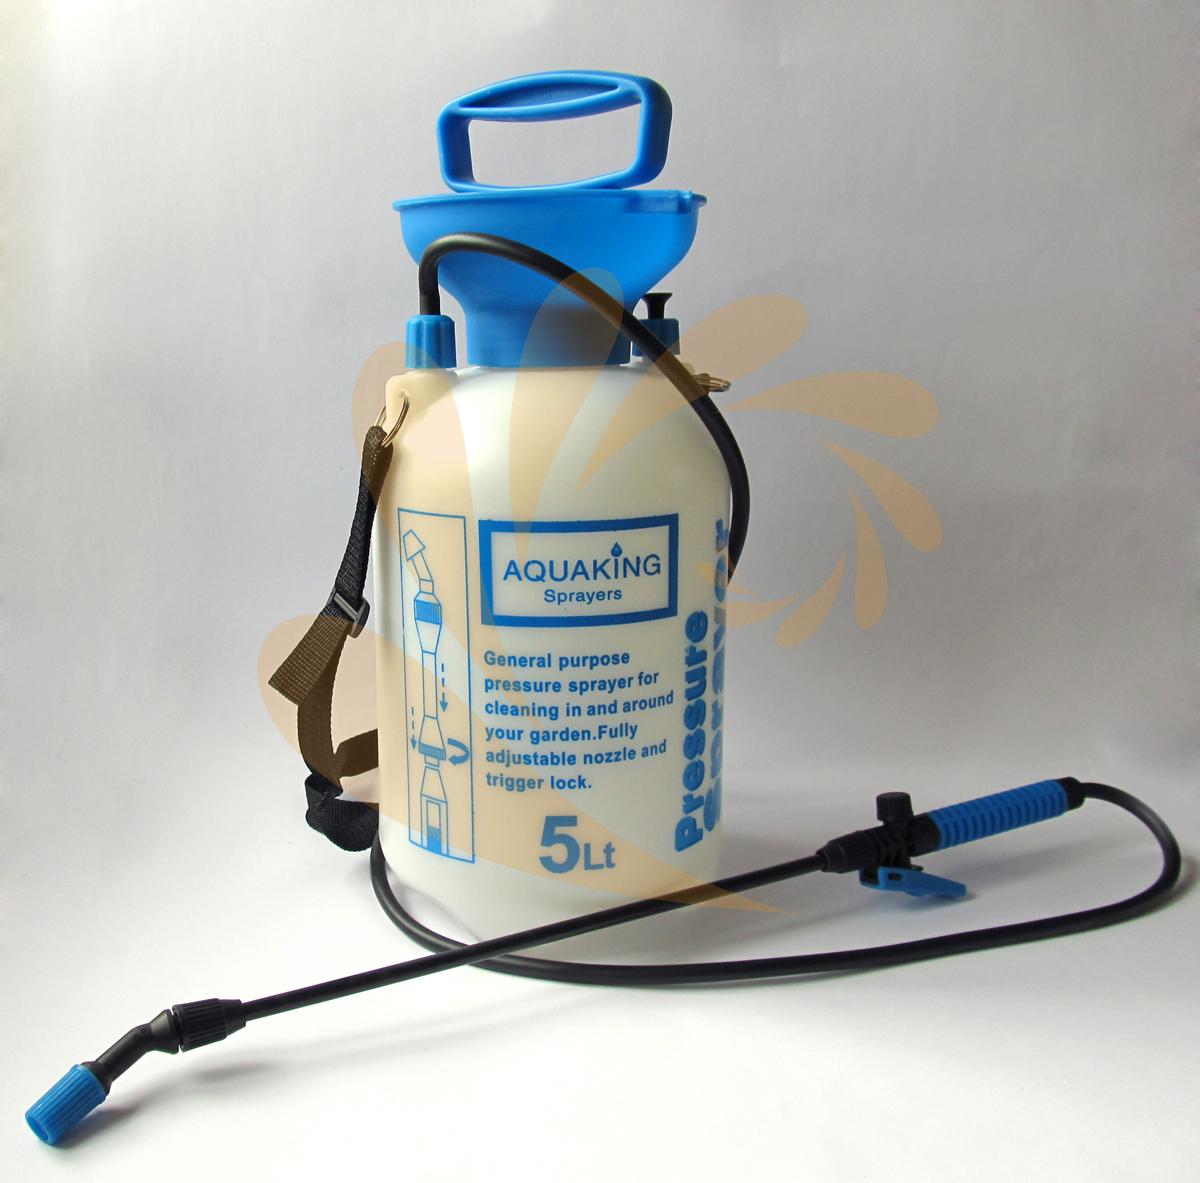 Rozprašovač tlakový 5 l Aquaking